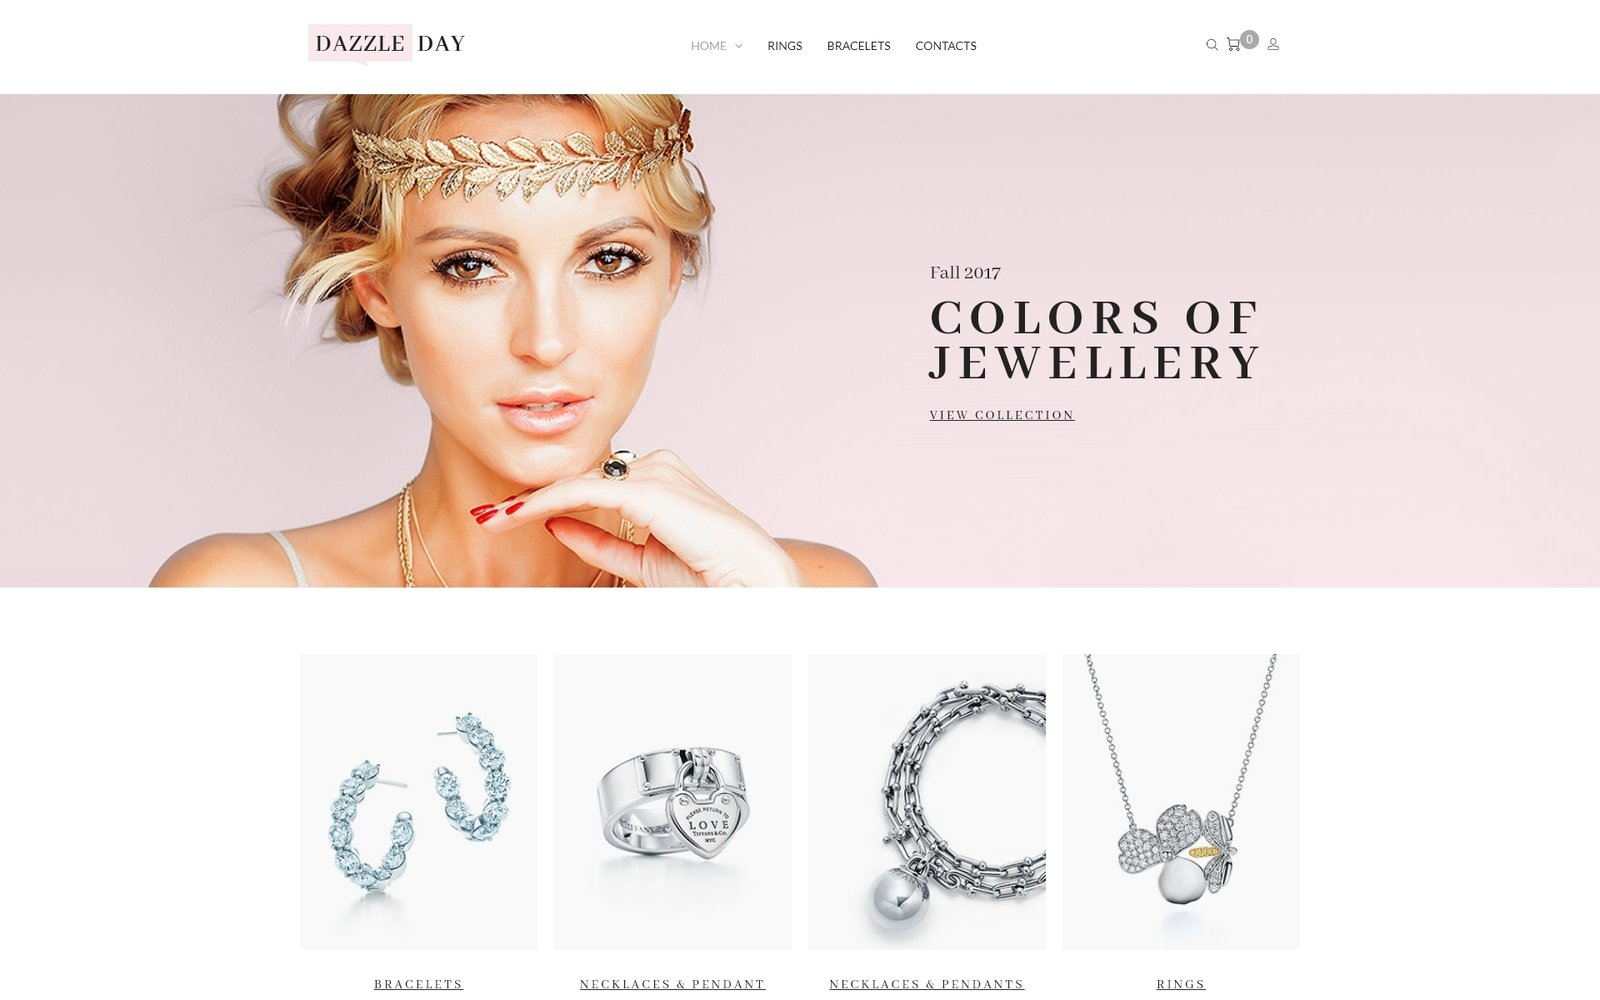 DazzleDay - Accessories Store WooCommerce Theme - screenshot